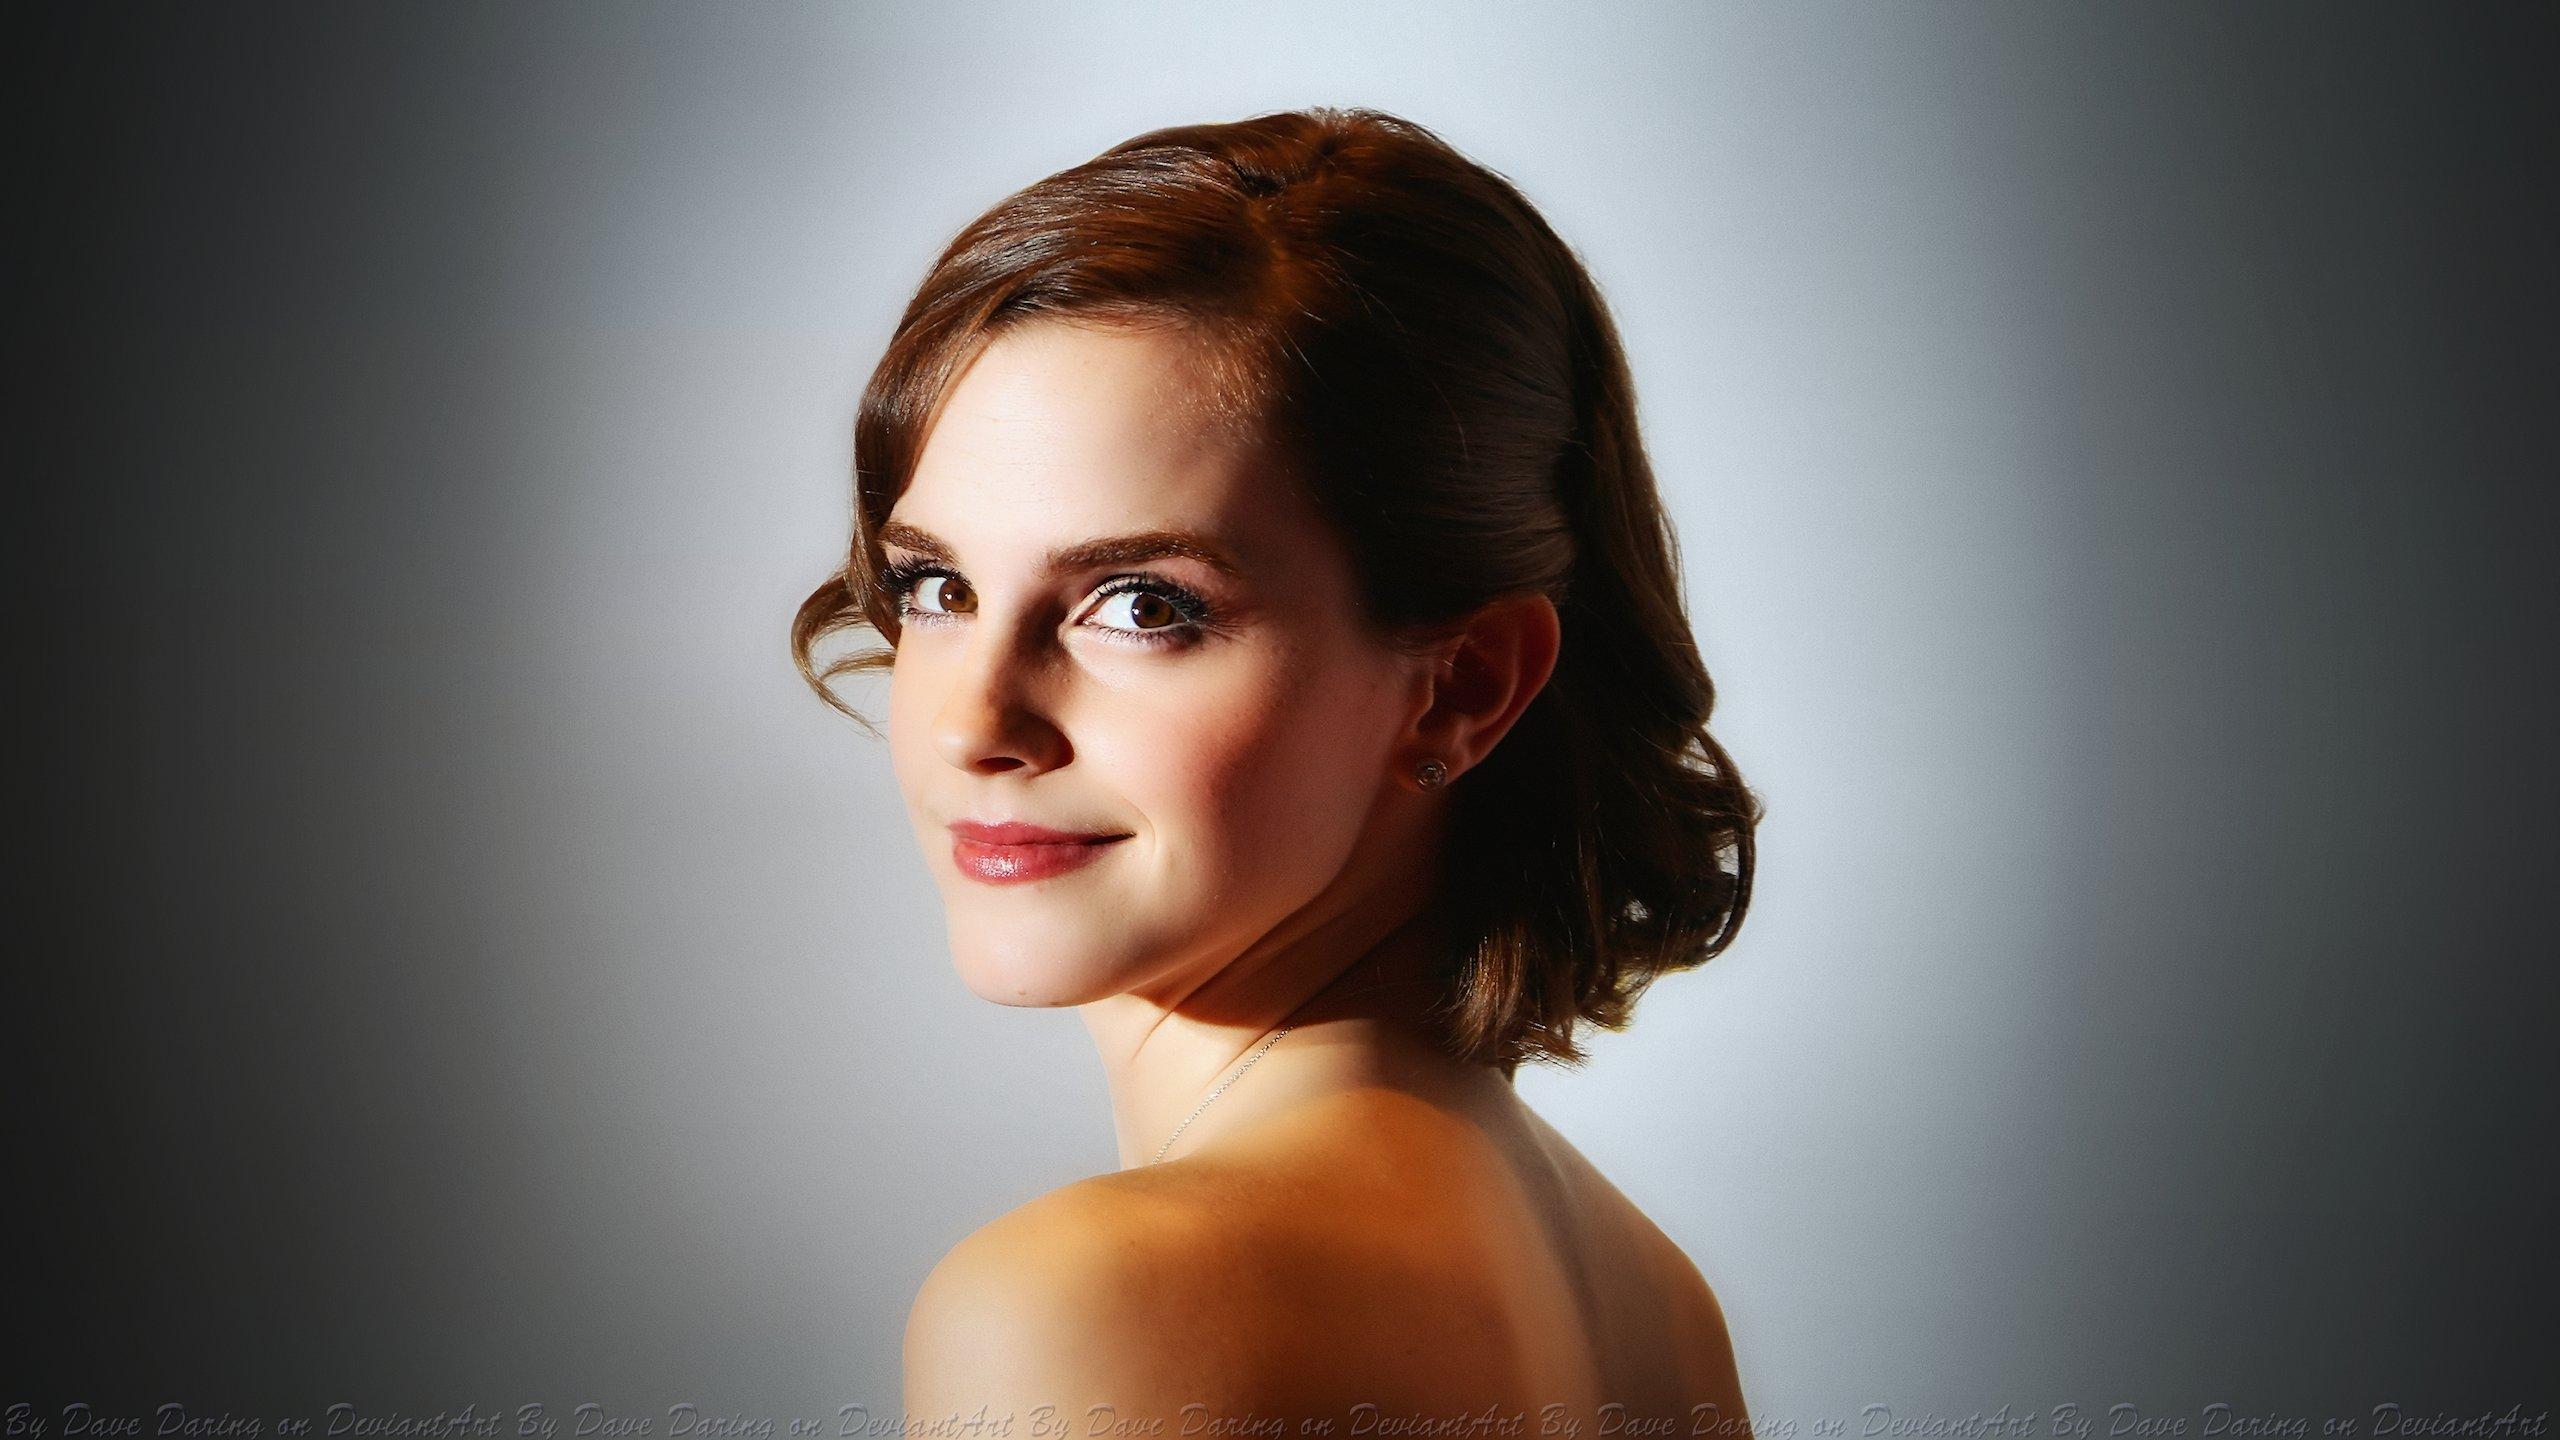 Emma Watson London Wallflower by Dave-Daring